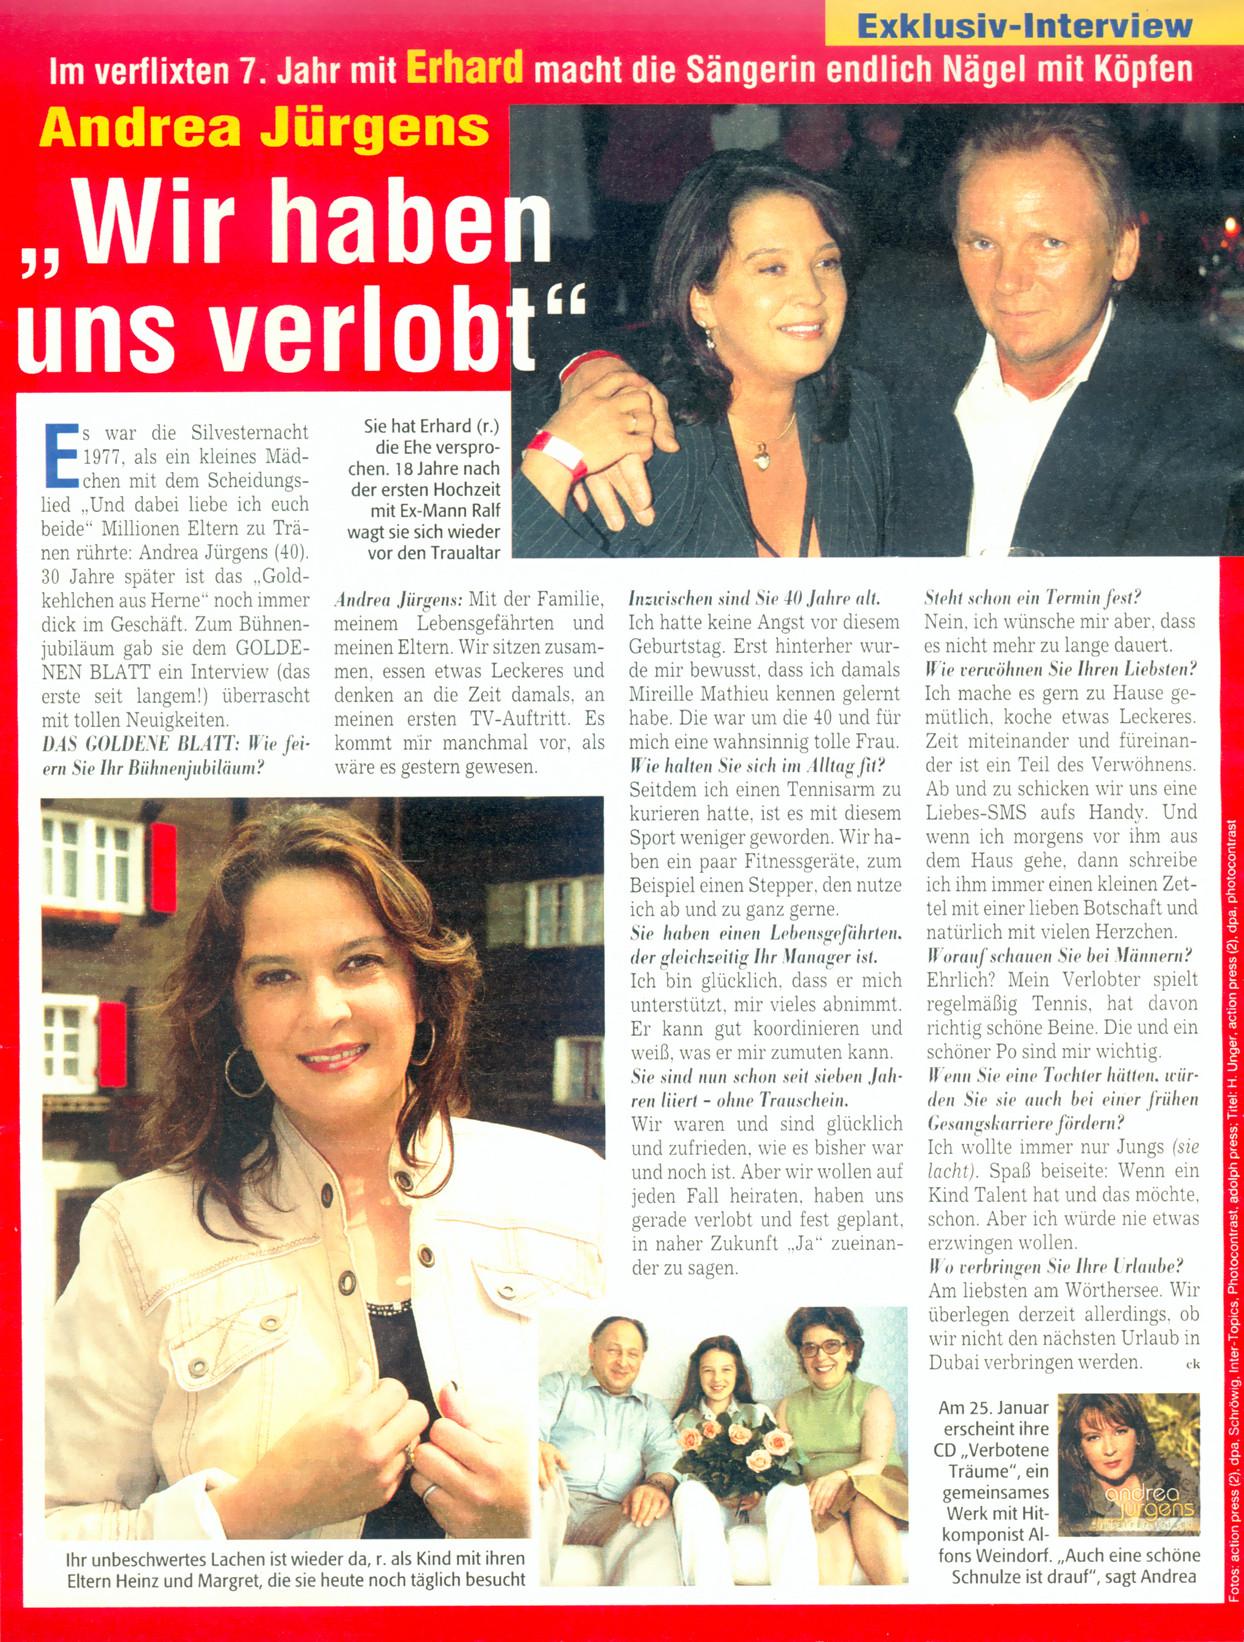 Andrea Jürgens Hochzeit Mit Ralf Stiller  Andrea Jurgens Hochzeit